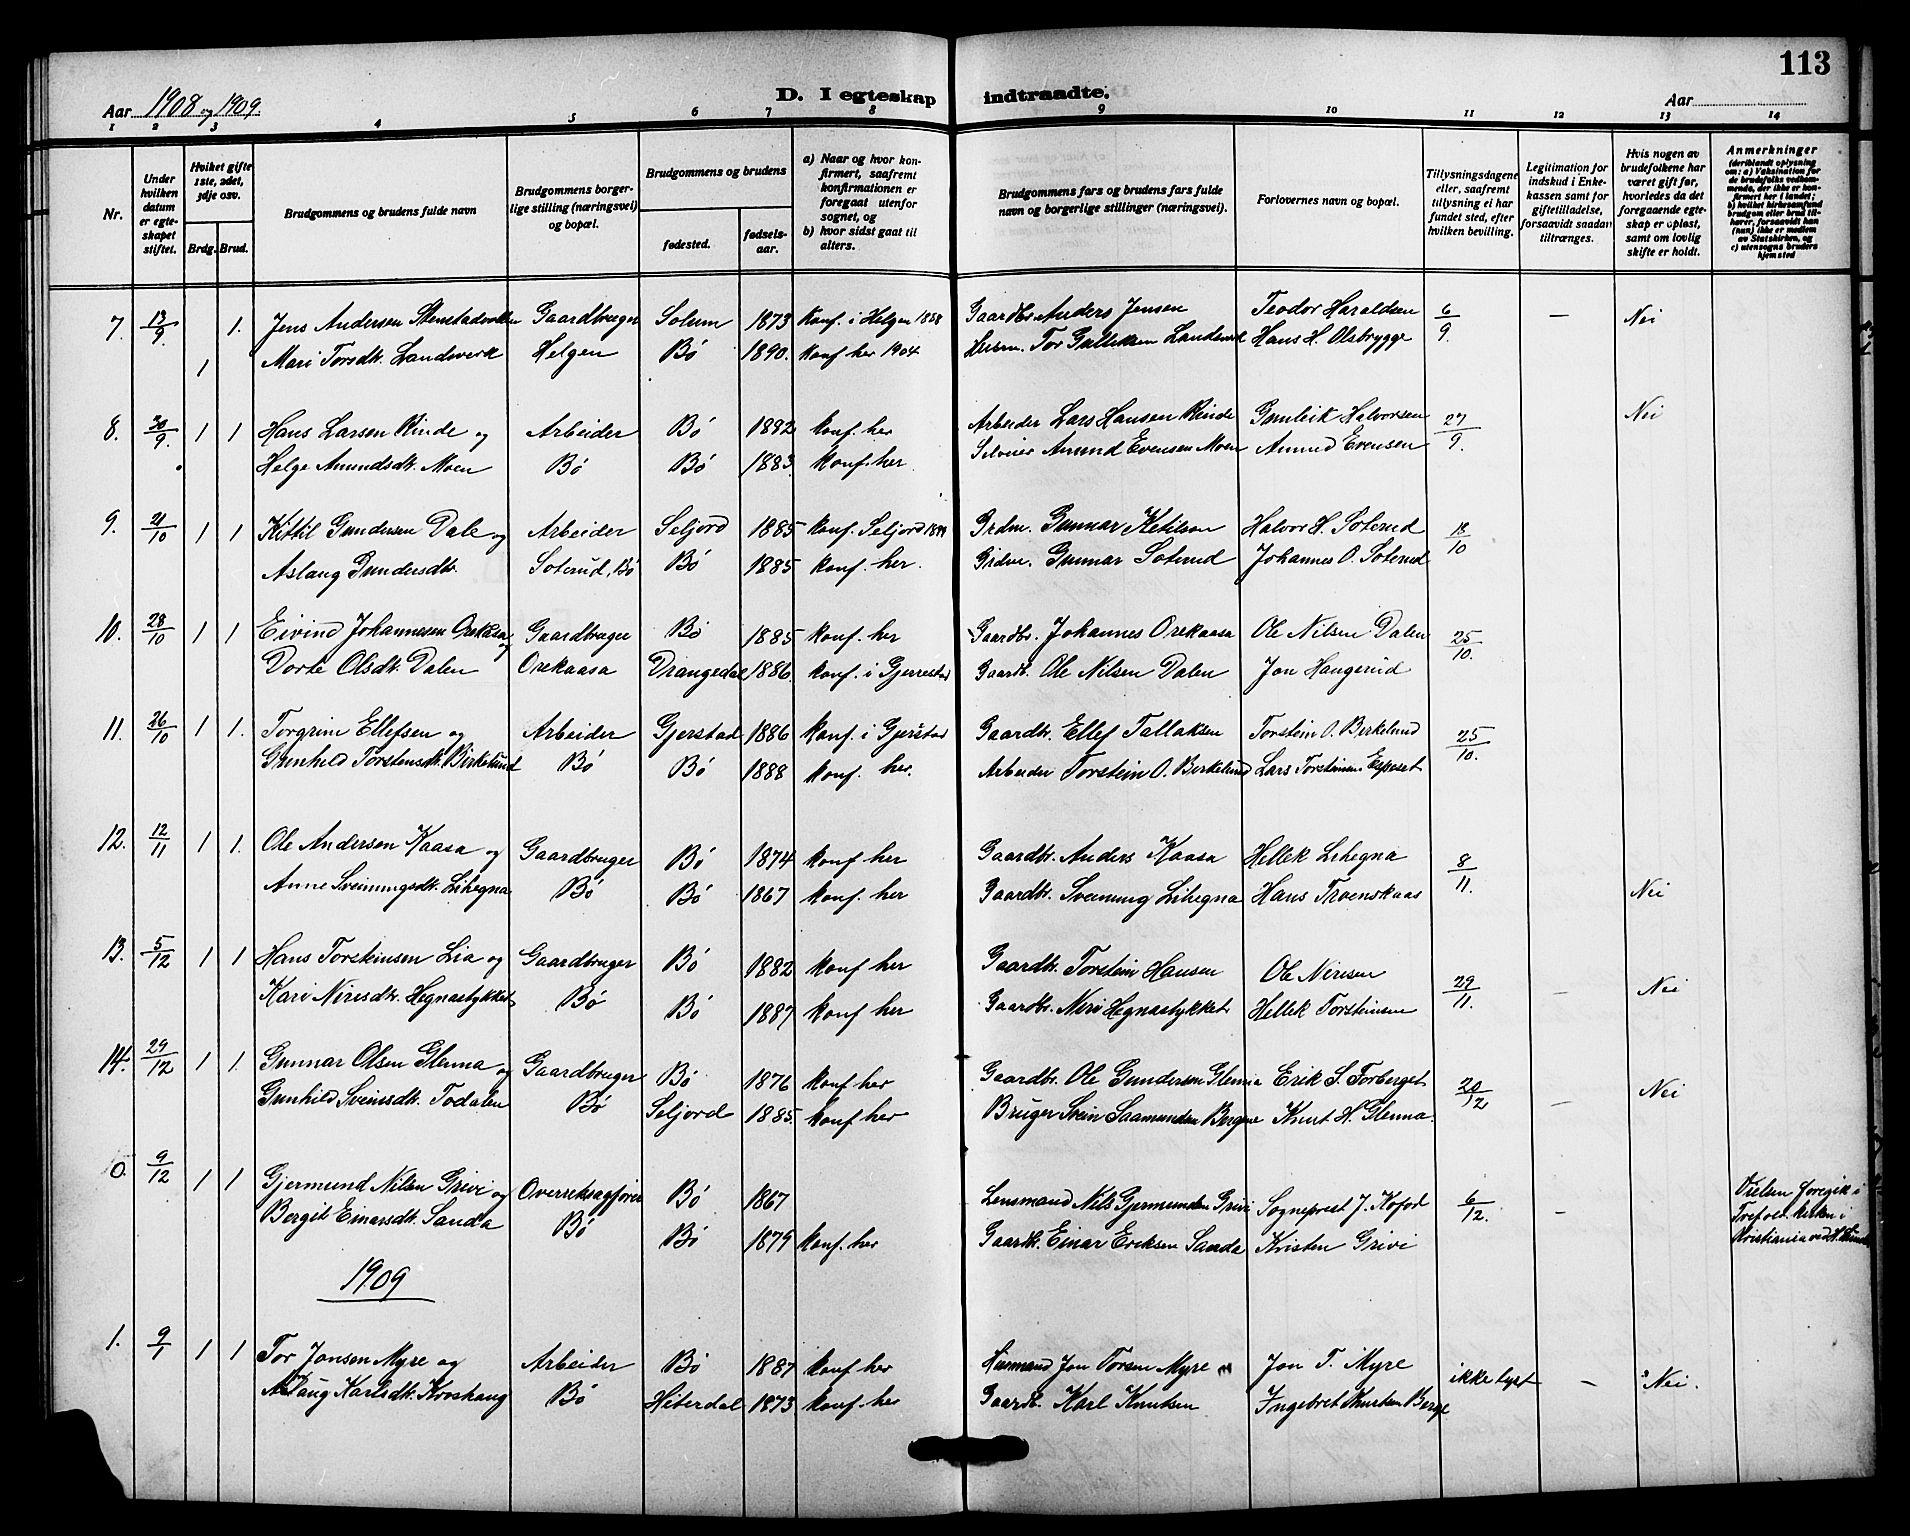 SAKO, Bø kirkebøker, G/Ga/L0007: Klokkerbok nr. 7, 1909-1924, s. 113